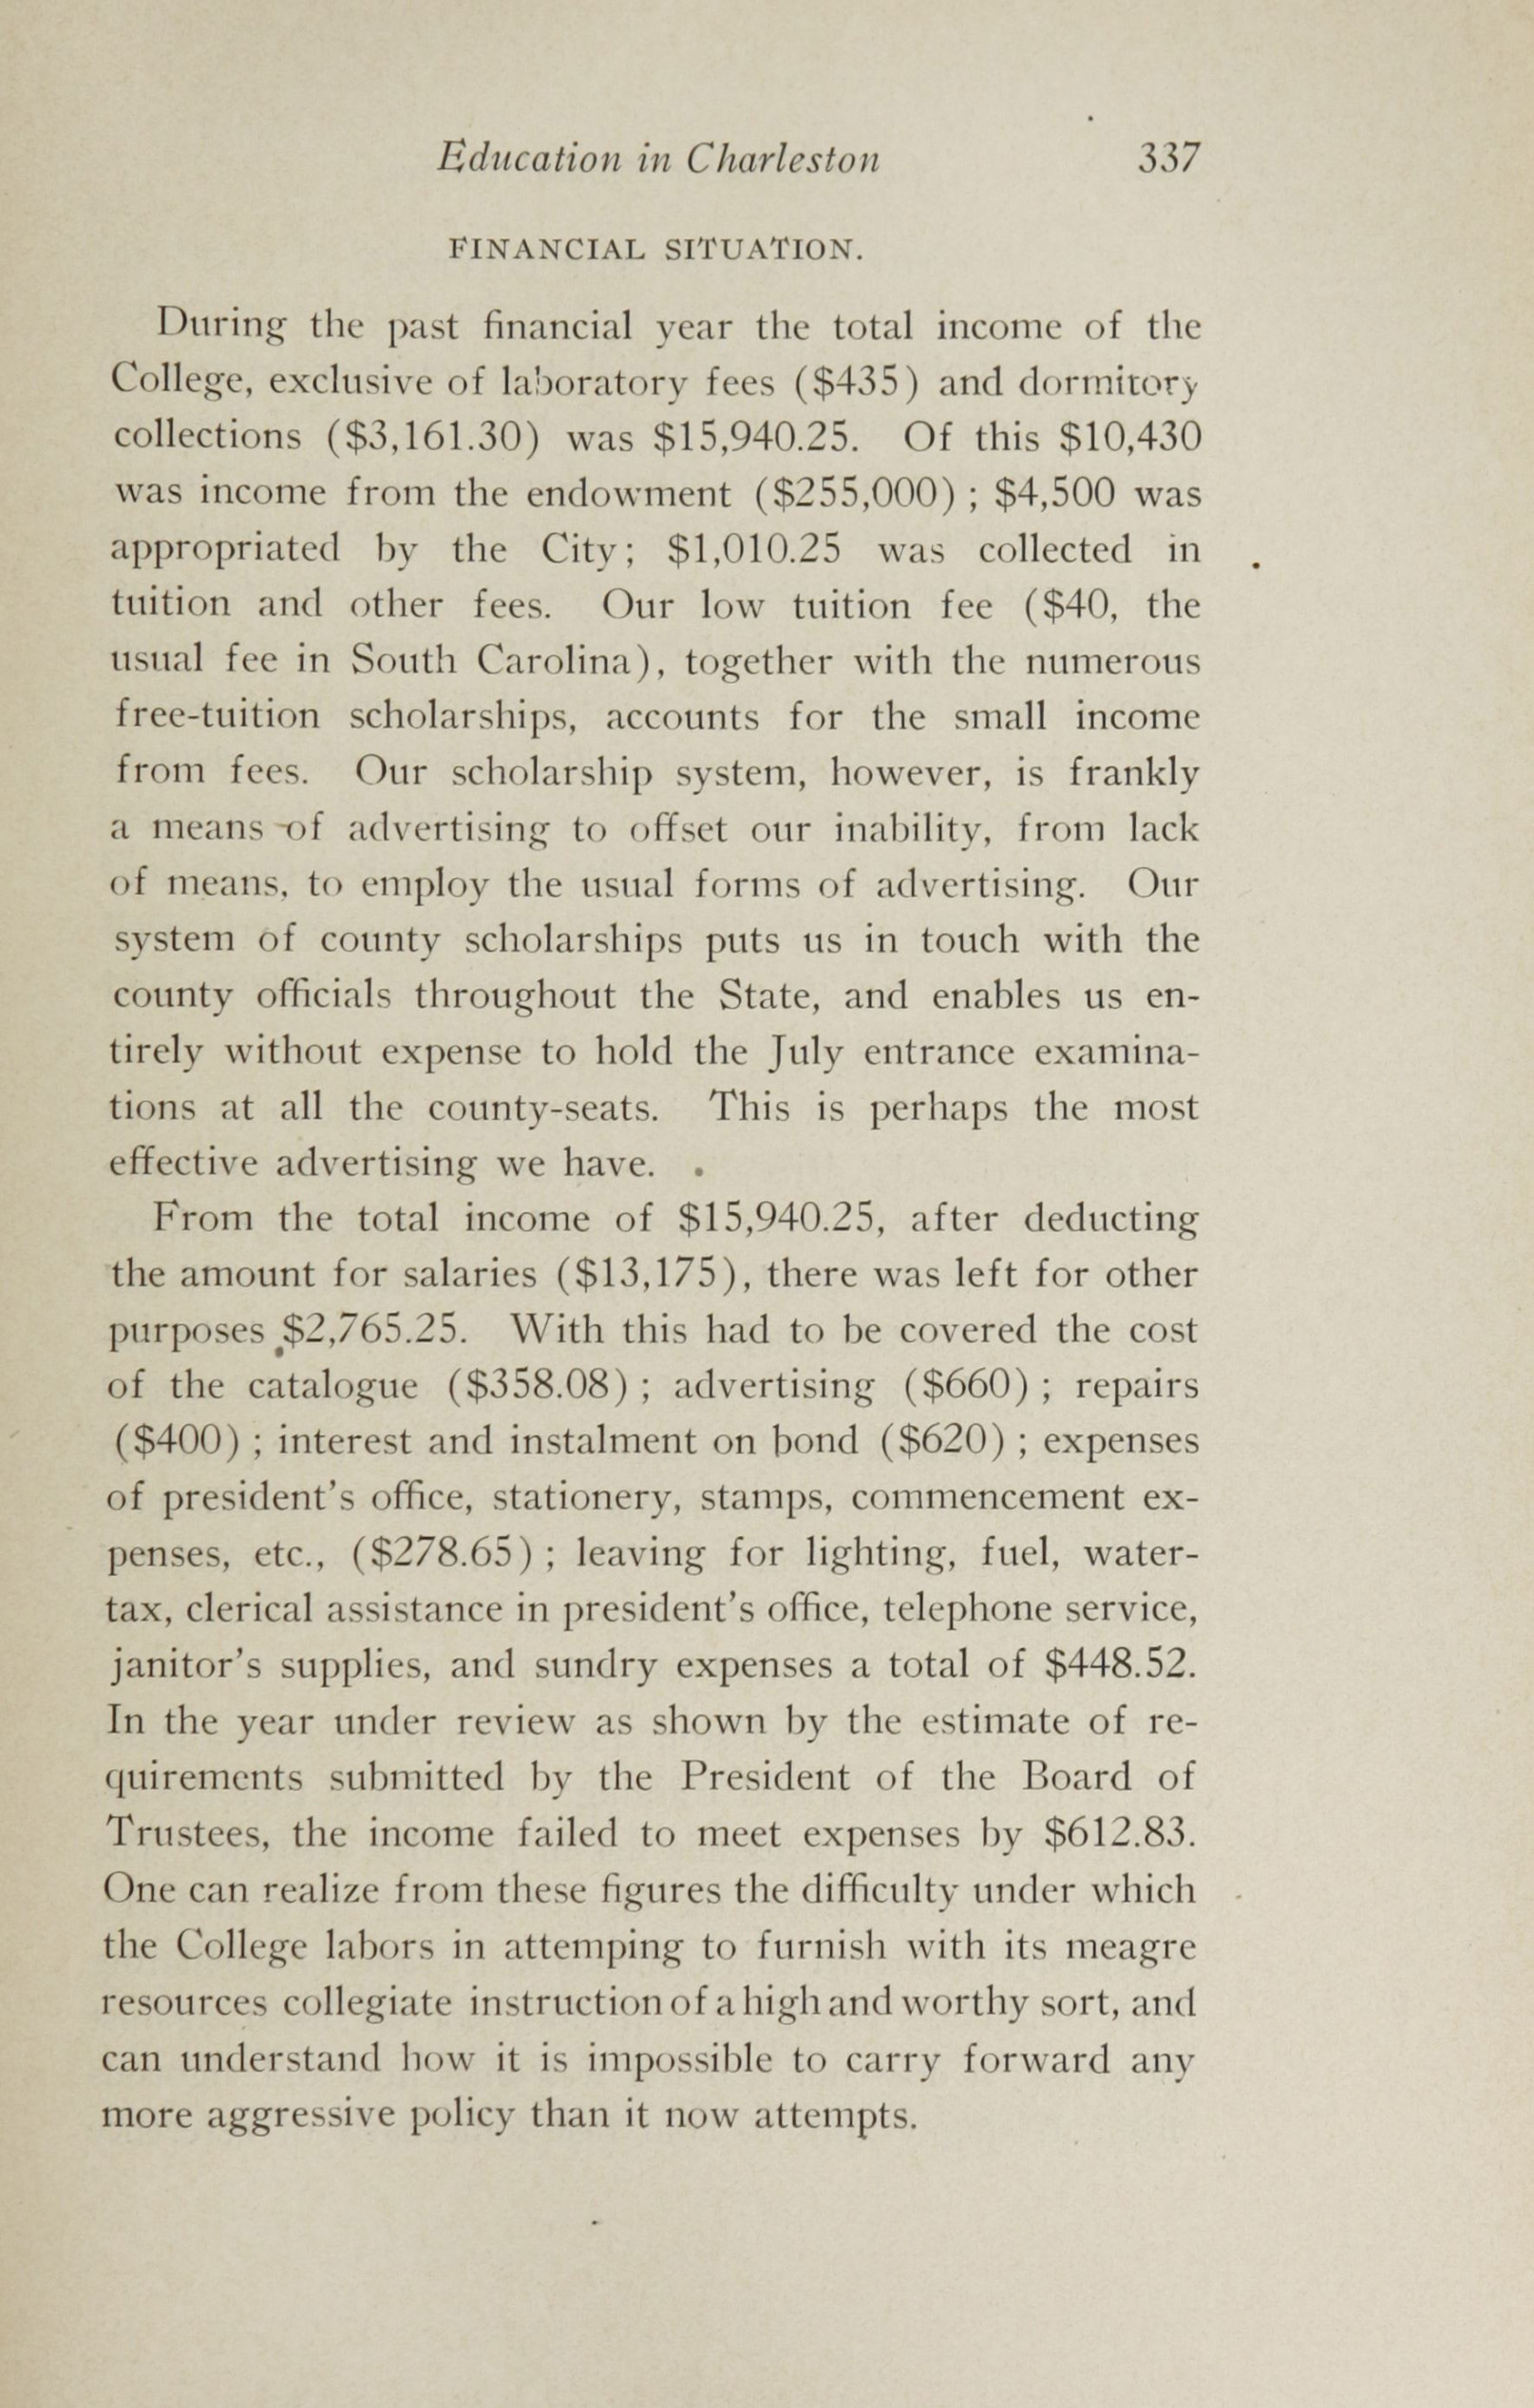 Charleston Yearbook, 1913, page 337